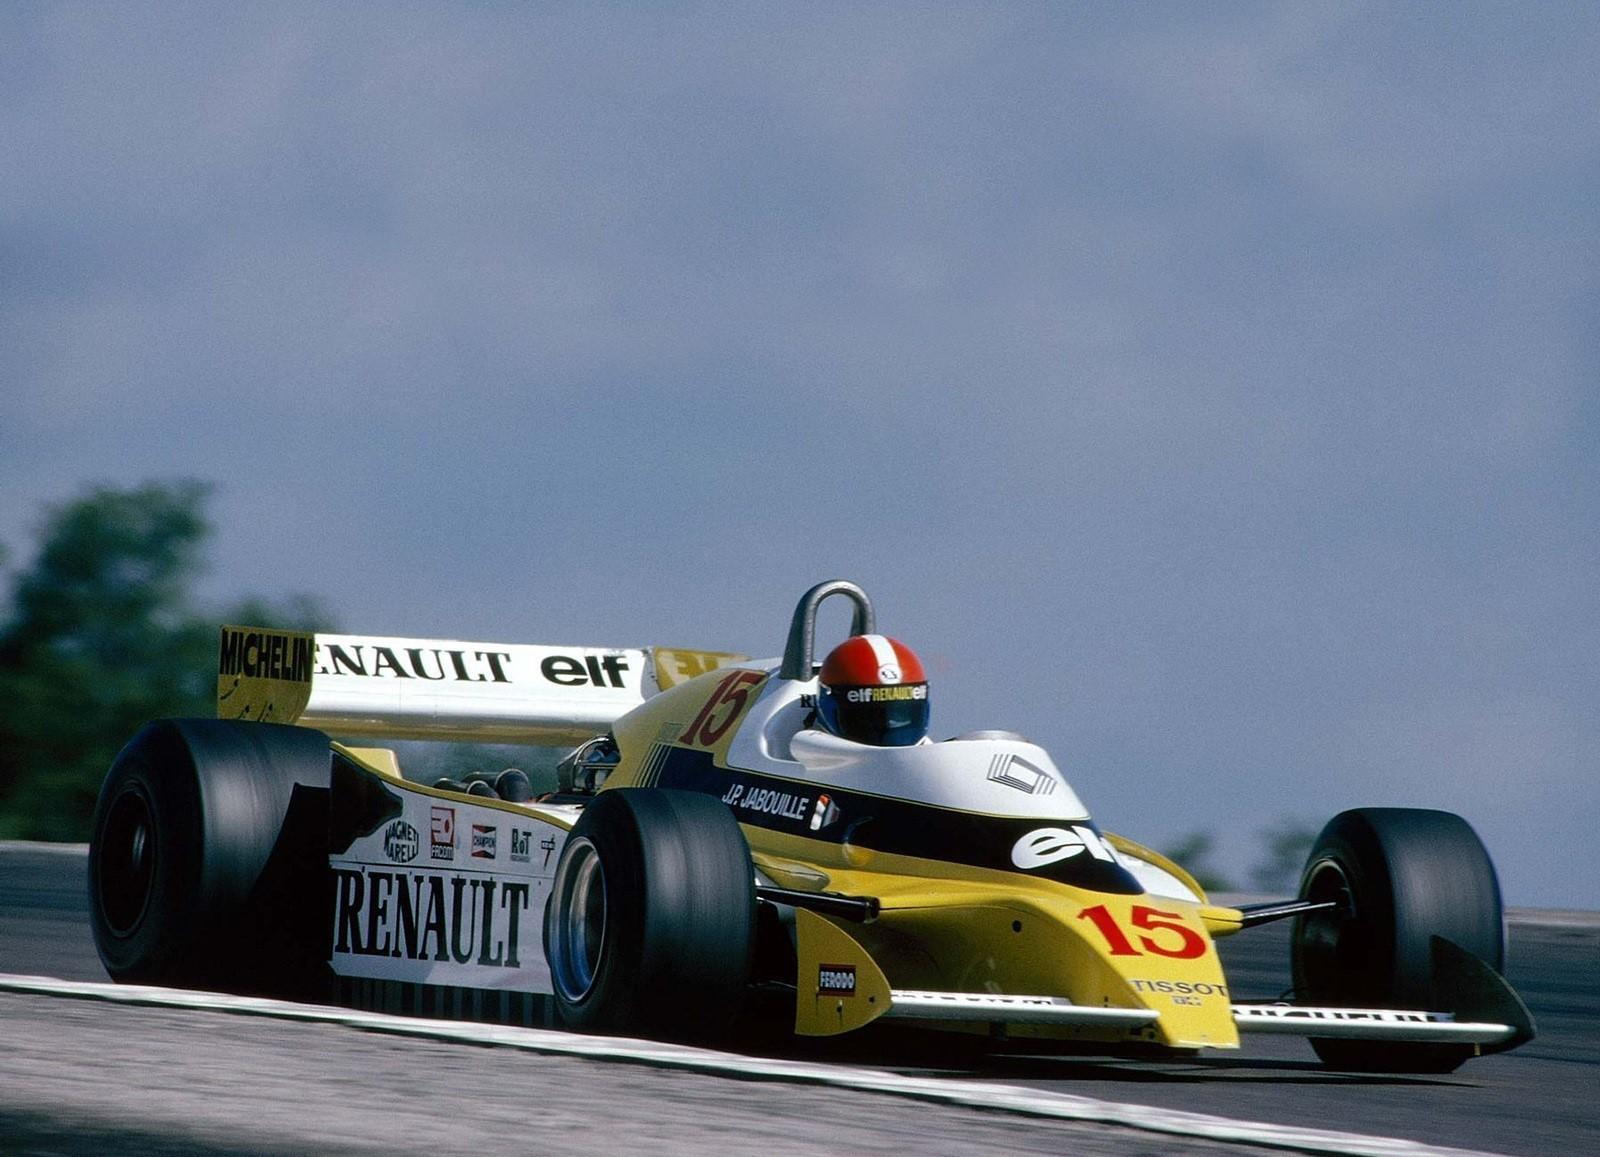 Renault RS10 F1